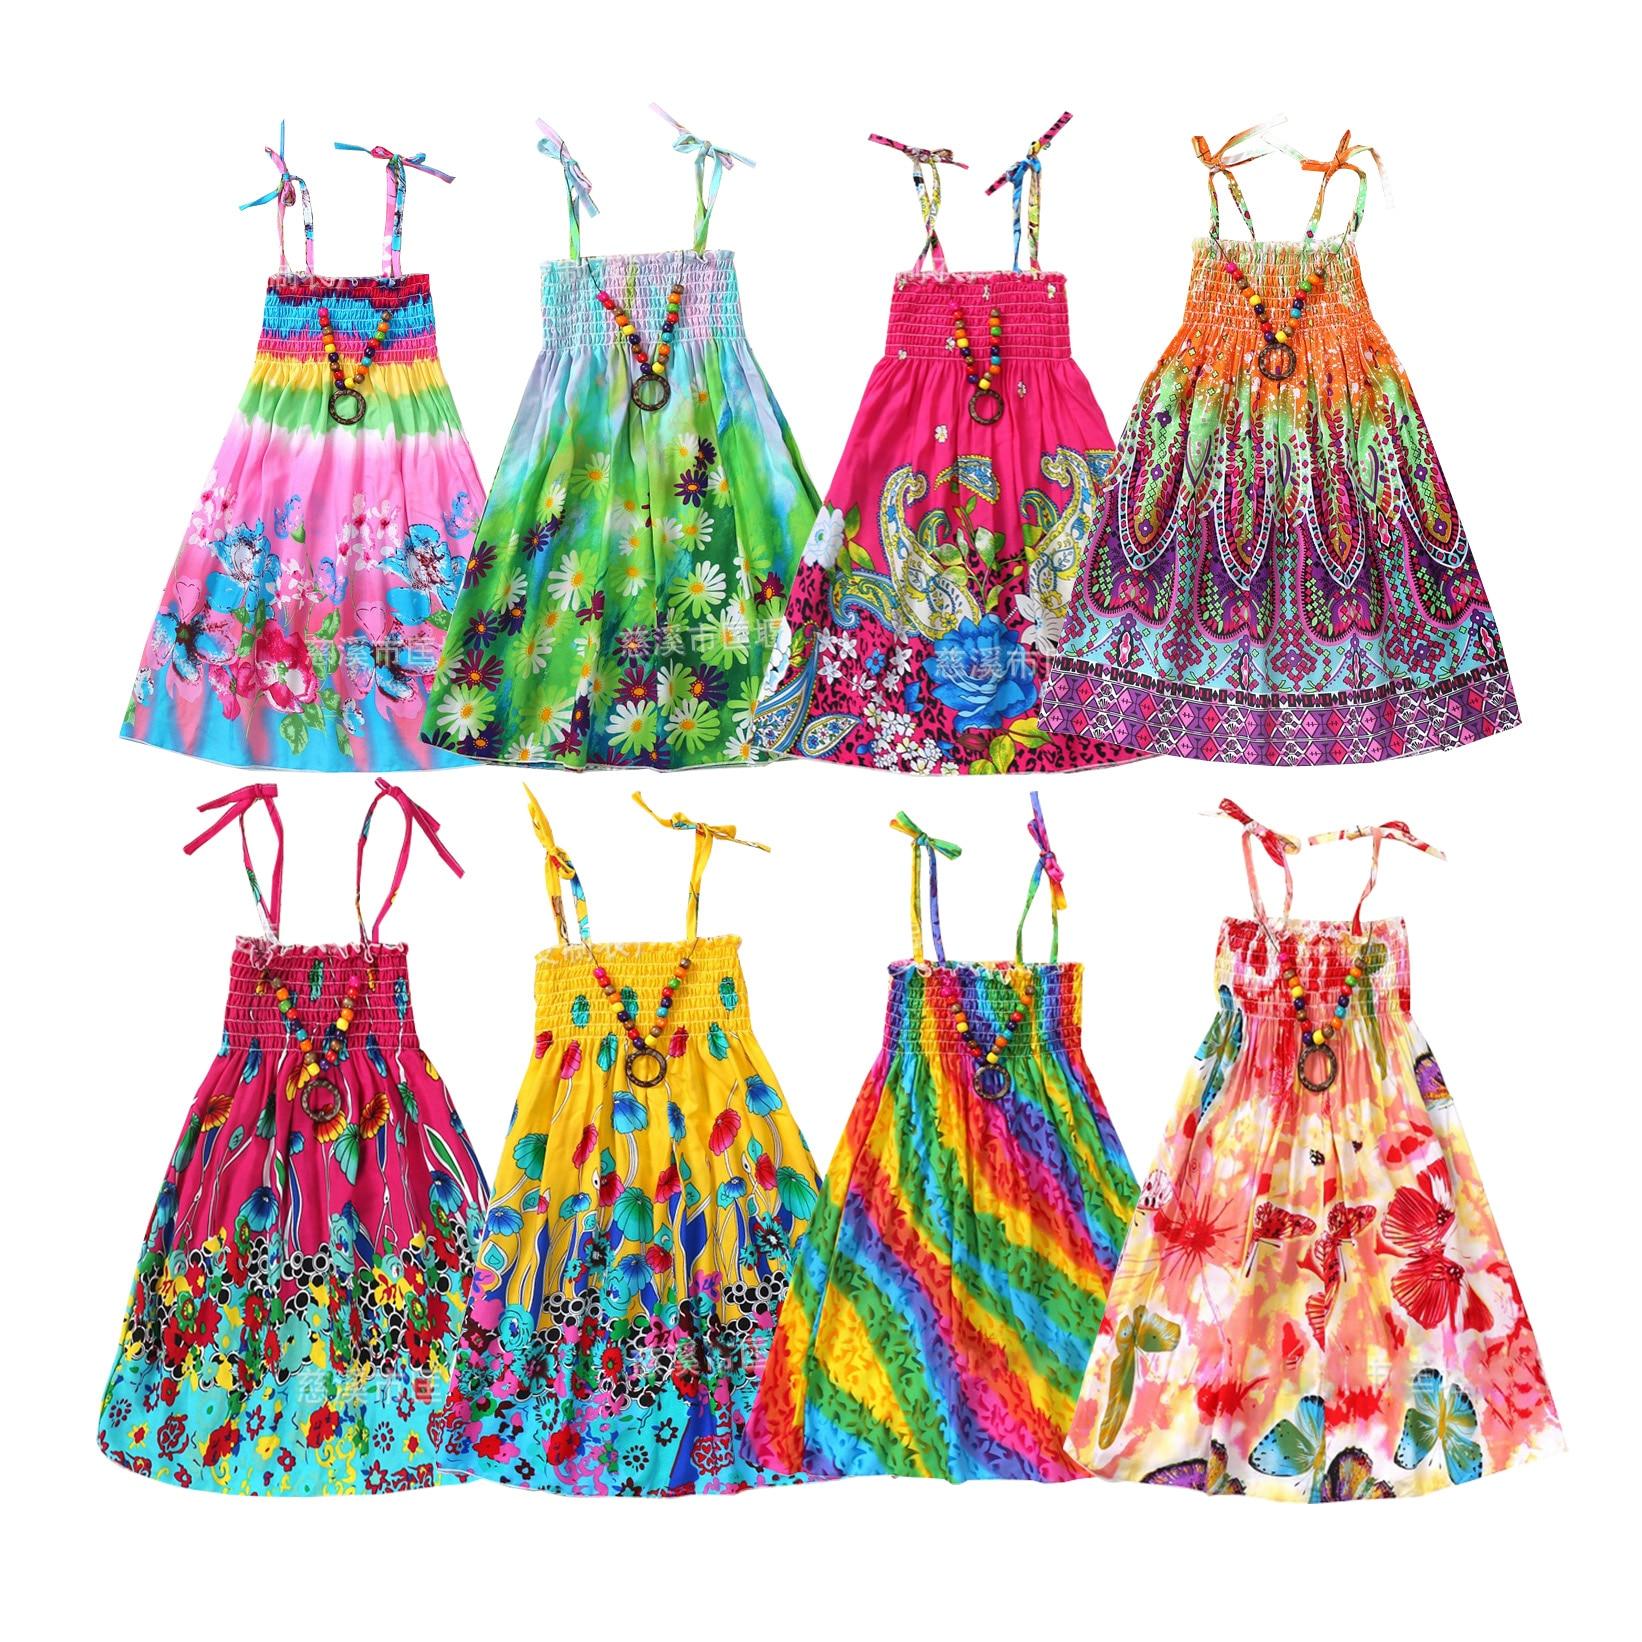 Summer Girls Rainbow Beach Dress Princess Dresses For Teen Girls Linen Clothes 3 6 9 12 Year With Necklace Gift